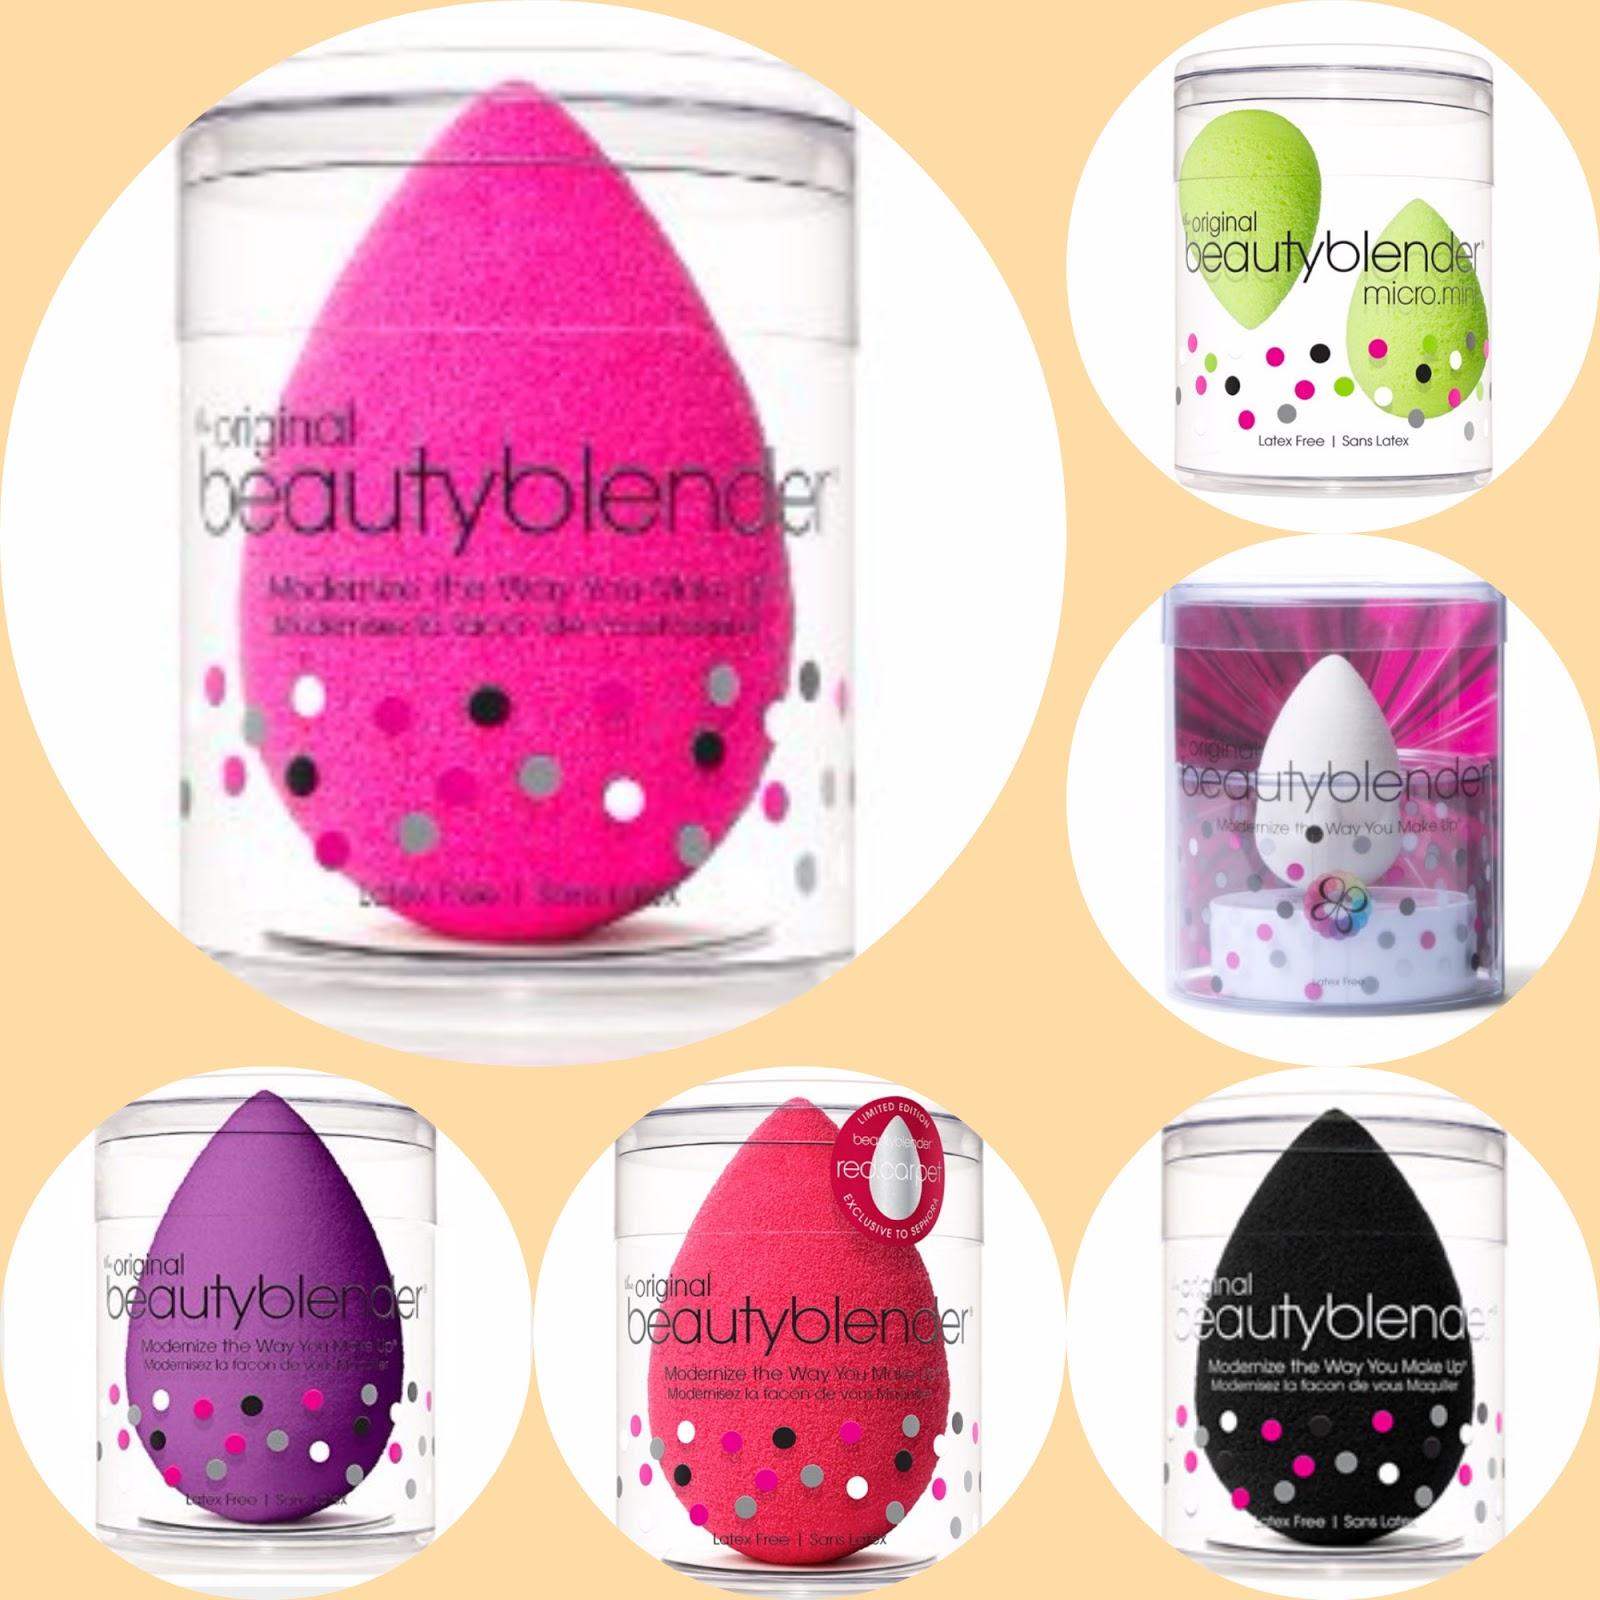 Beauty Blender Original Vs Pro: Diaper Bags And Lipgloss: Choosing Your Beauty Blender And